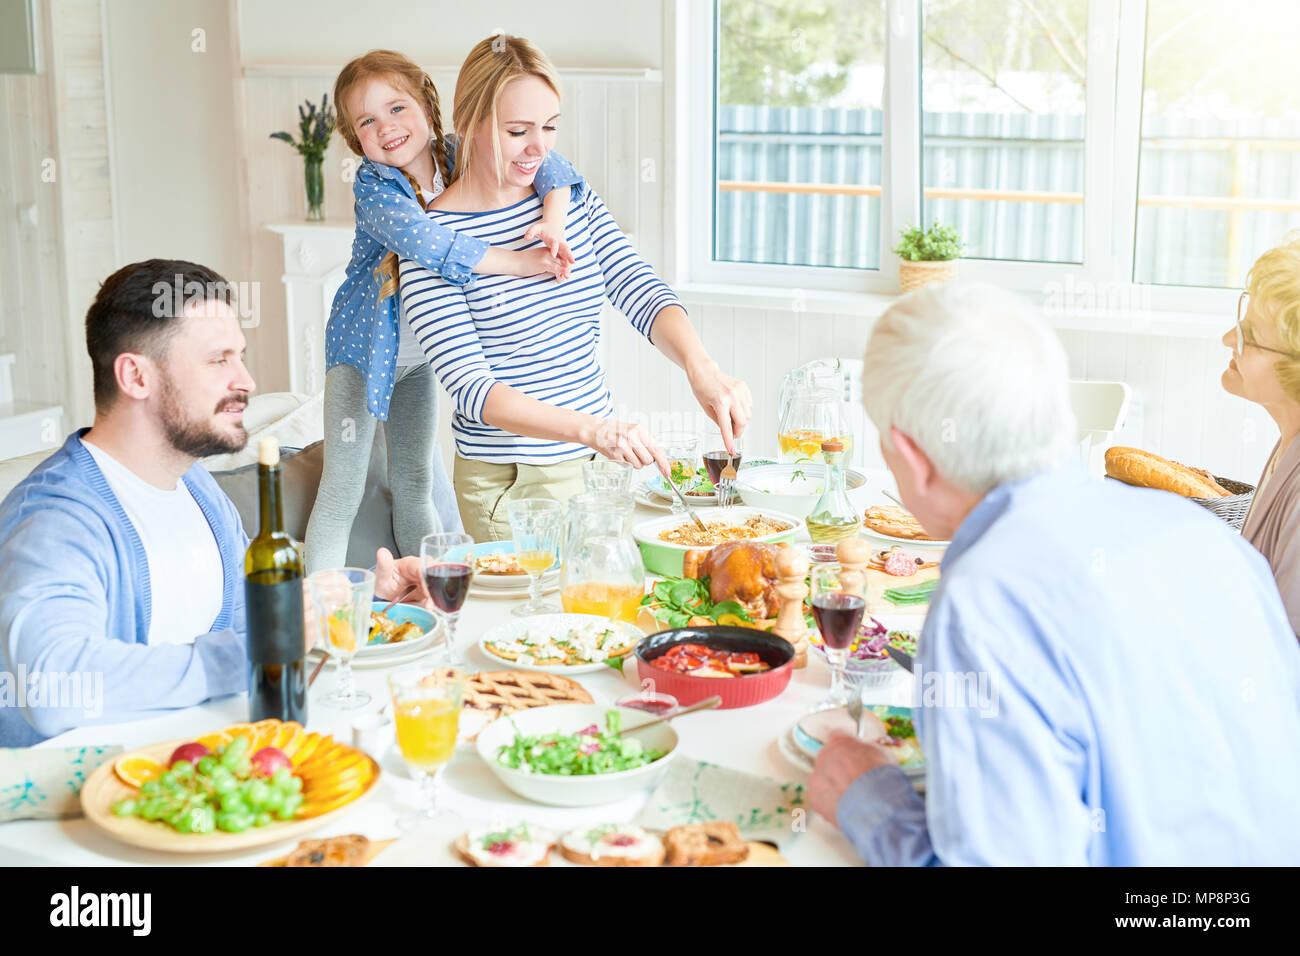 Feliz madre sirviendo comida en la cena familiar. Imagen De Stock